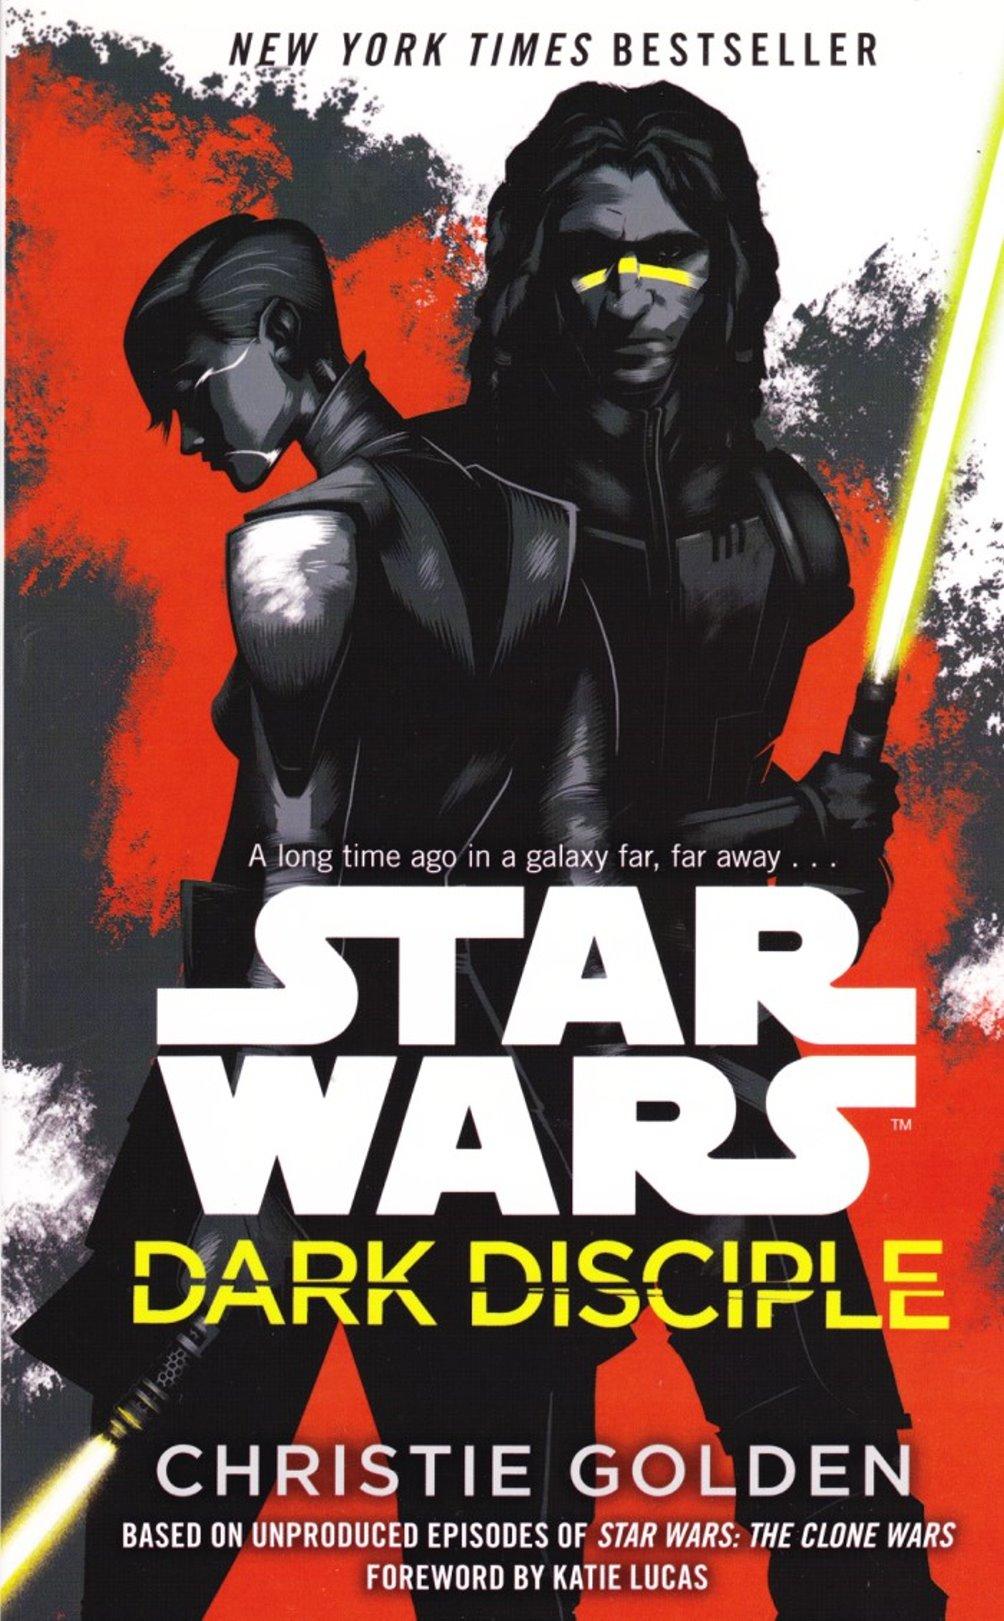 Book Review: Star Wars: Dark Disciple - Fantha Tracks